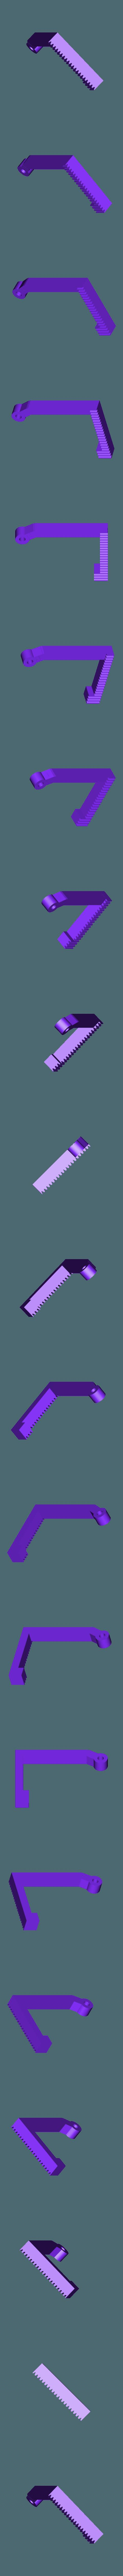 gear-railB.stl Download free STL file Mechnolia • 3D printing template, ChrisBobo